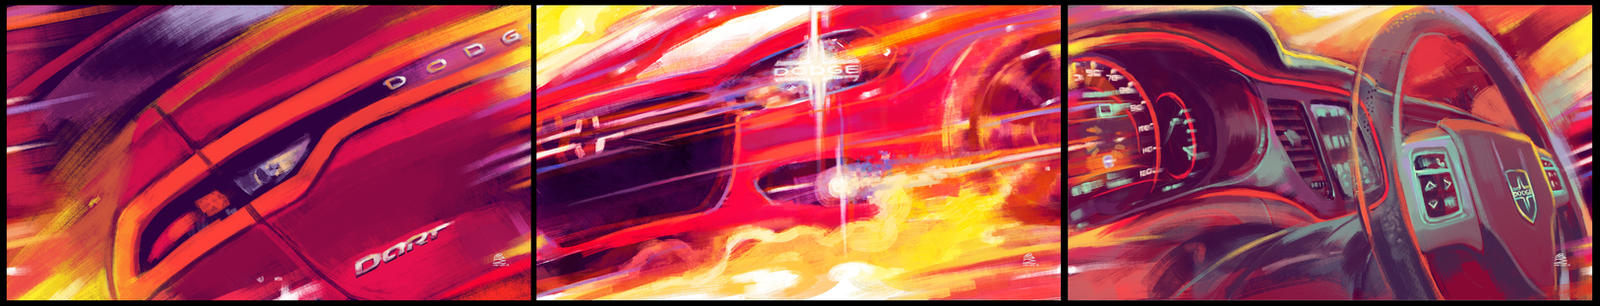 Dodge Dart - triptych by solidgrafi